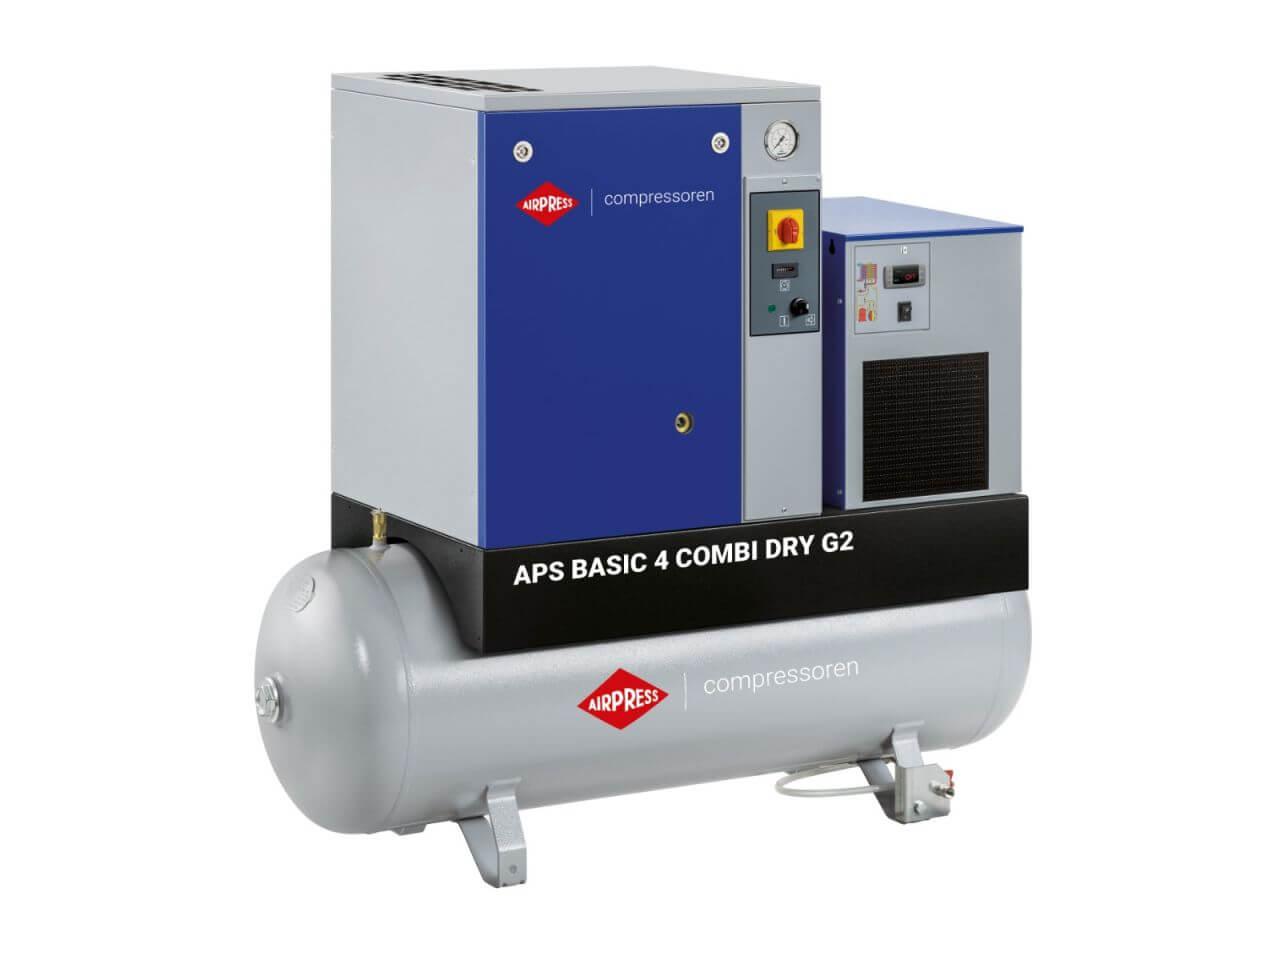 APS 4 combi dry